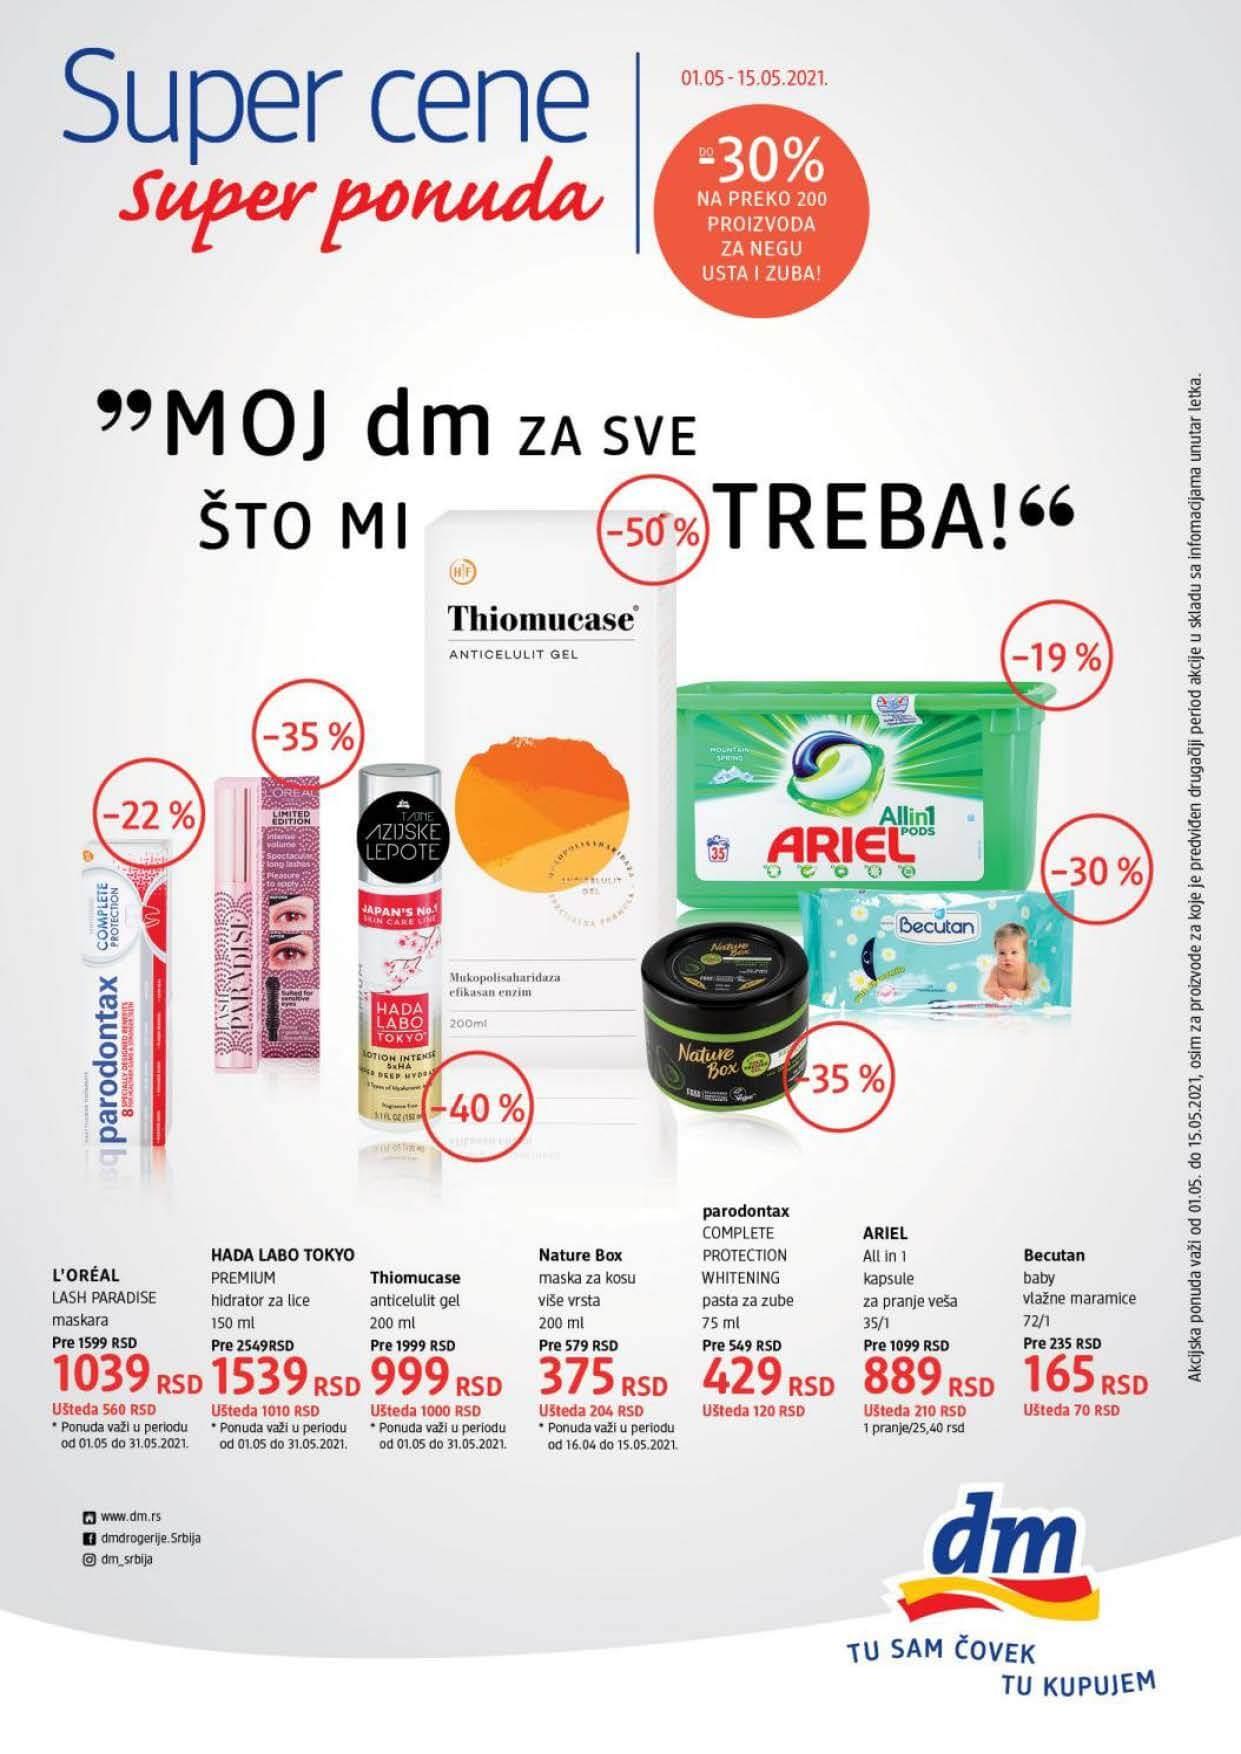 DM katalog SUPER CENE Srbija MAJ 2021 01.05.2021. 15.05.2021. Page 1 1